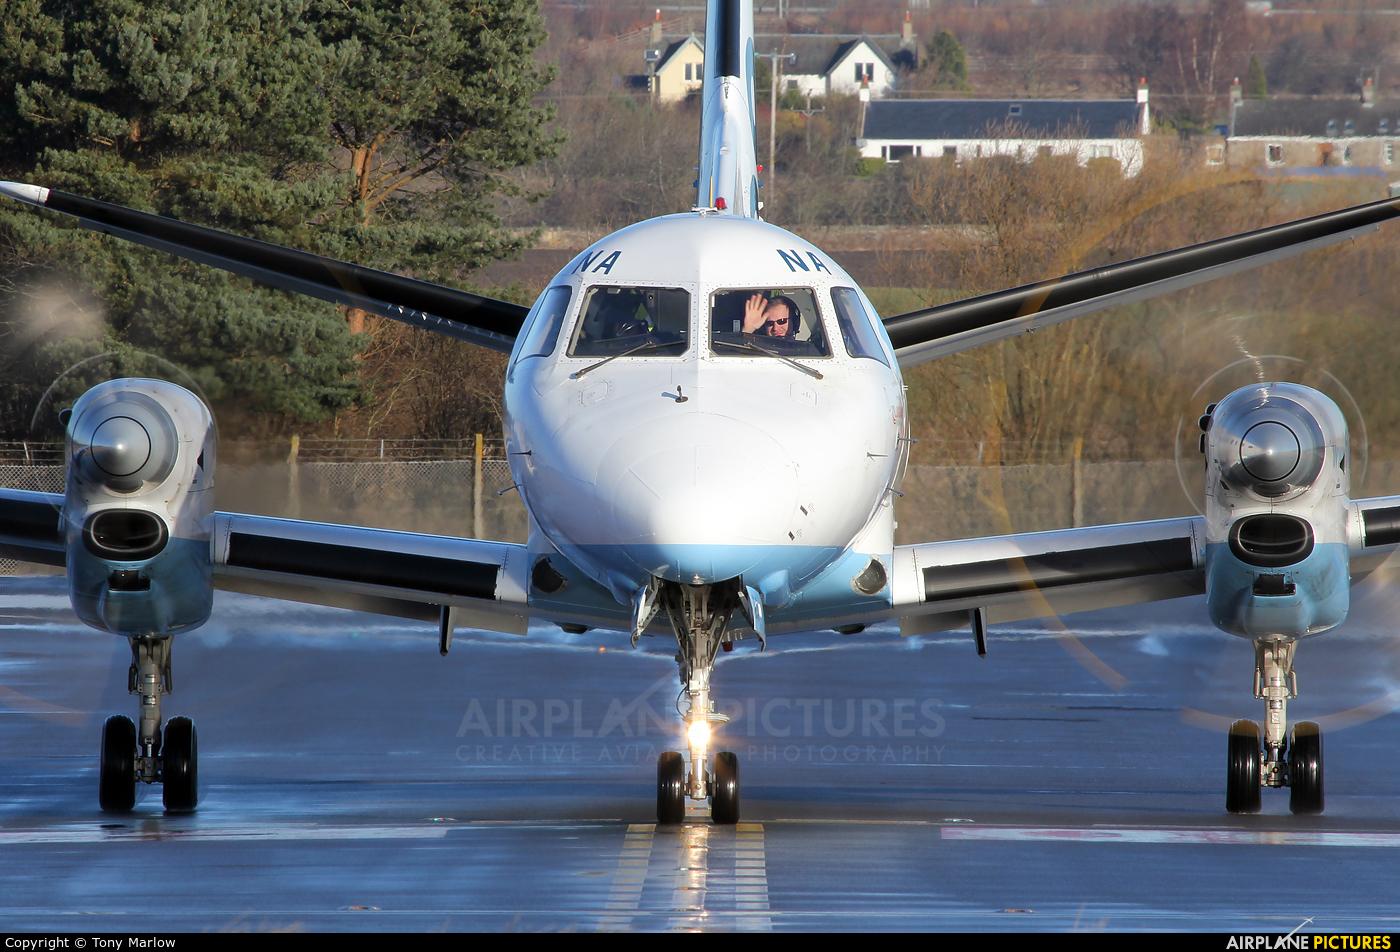 FlyBe - Loganair G-LGNA aircraft at Edinburgh